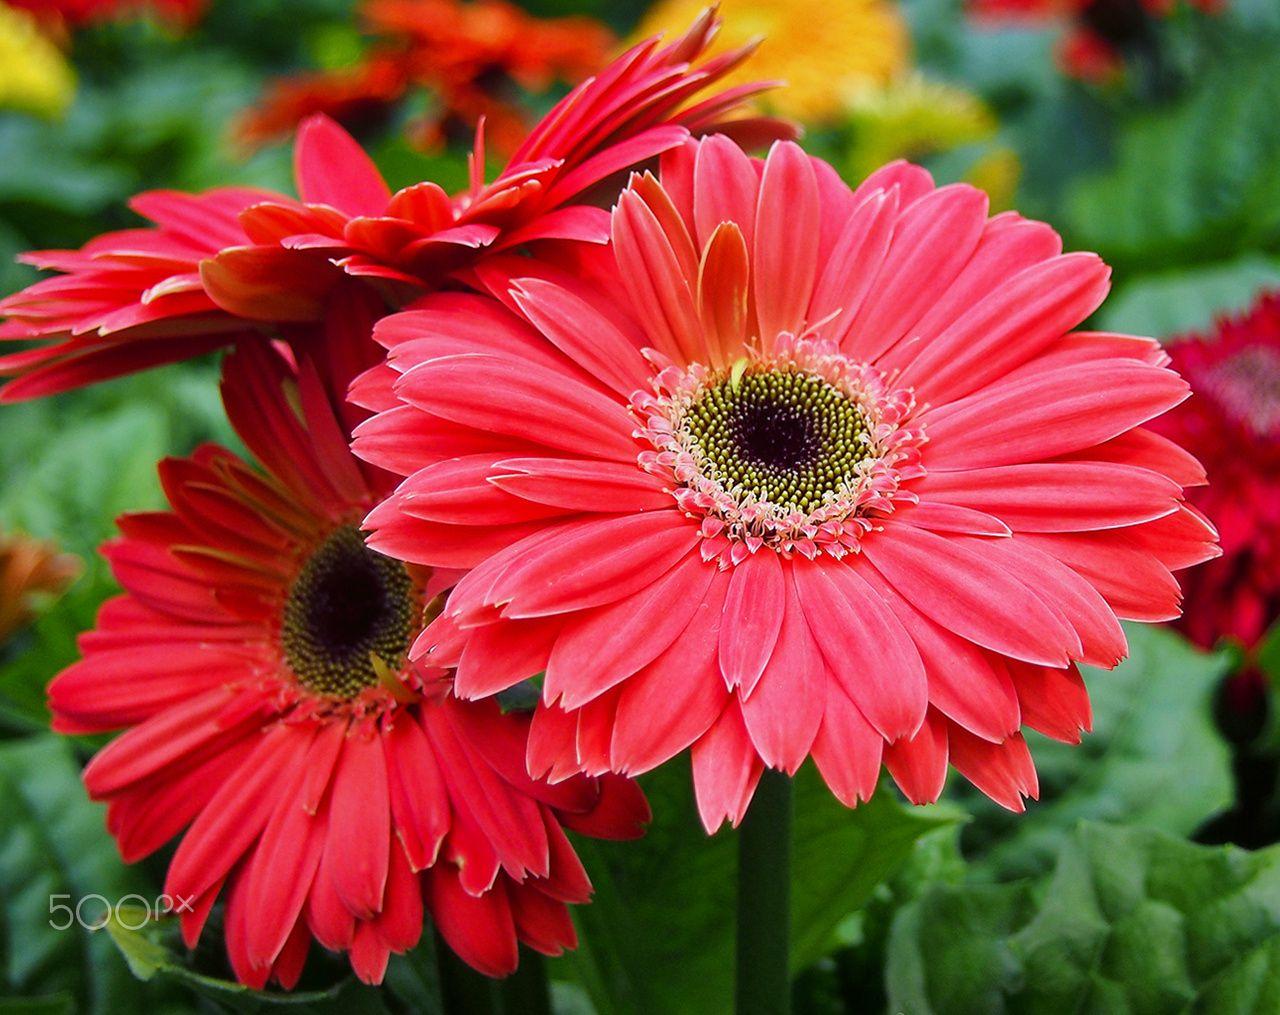 Red daisy flower olympus digital camera papatya gerbera red daisy flower olympus digital camera izmirmasajfo